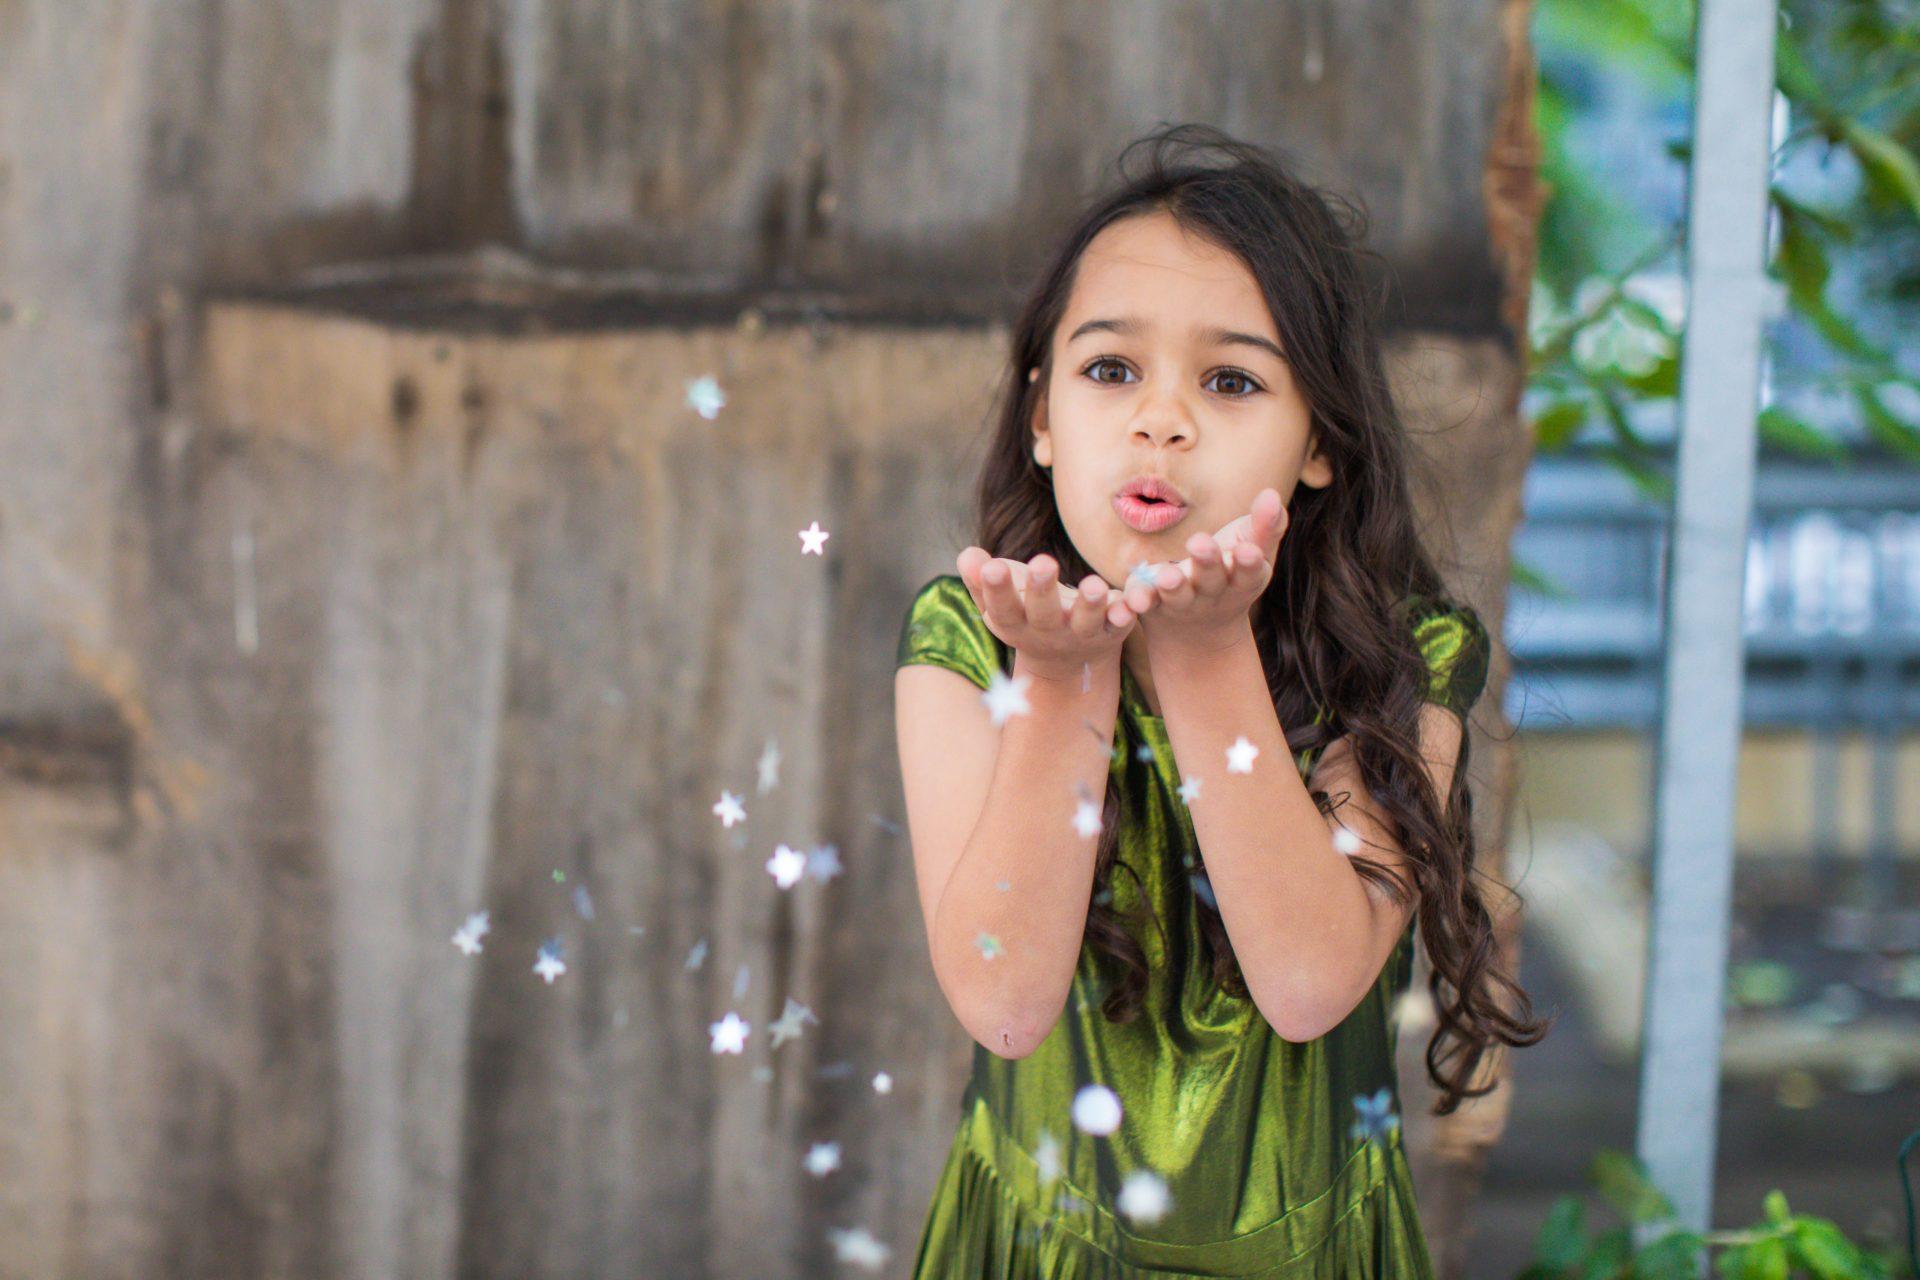 girl in green dress blowing star confetti